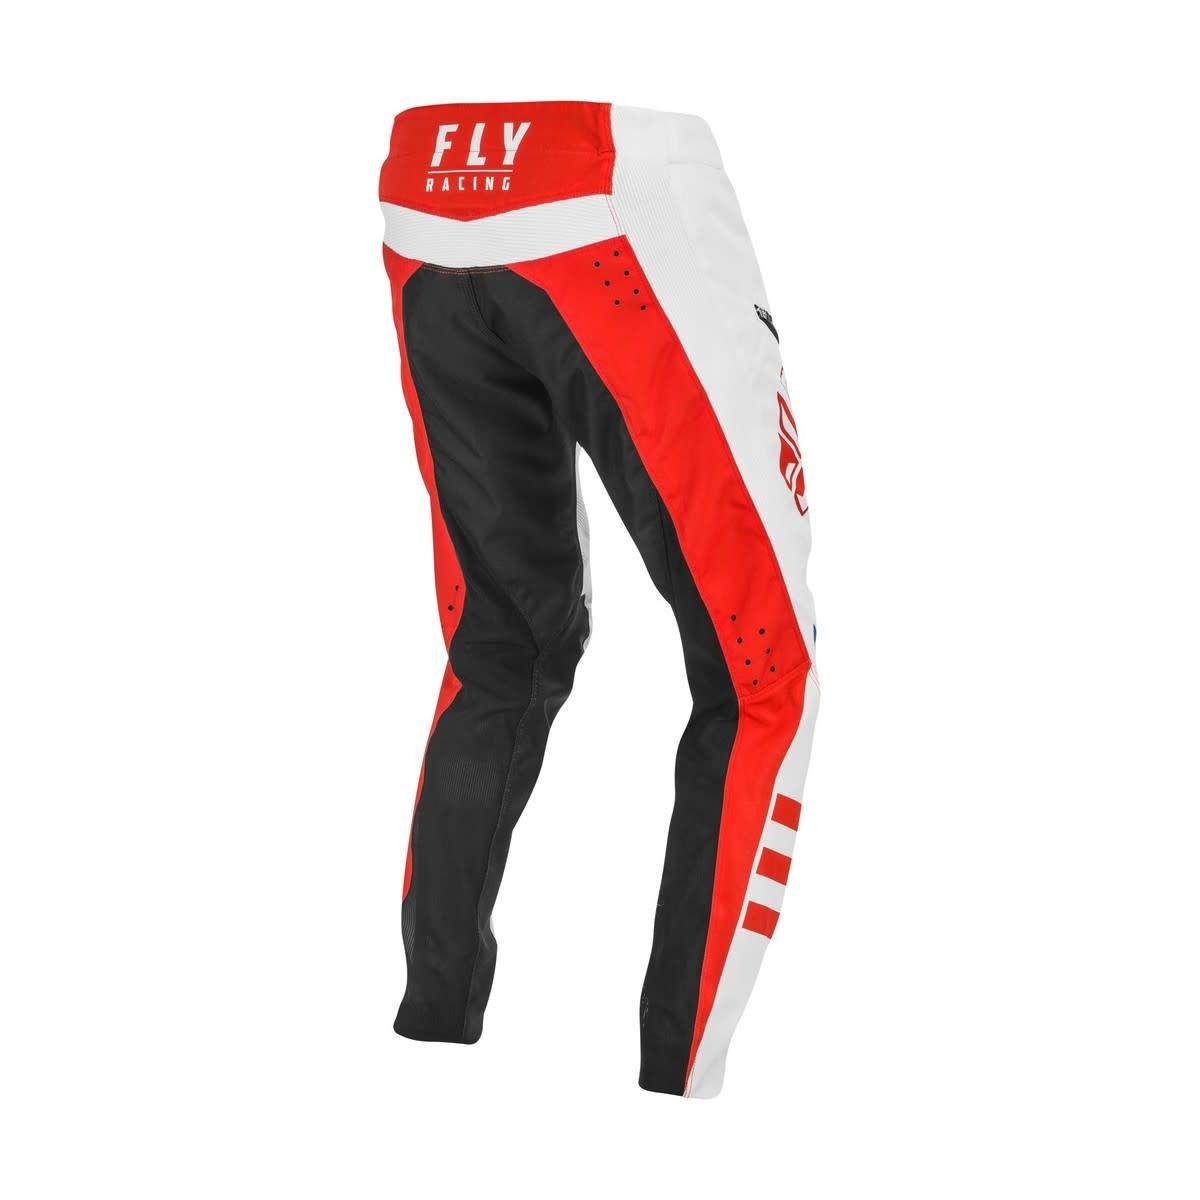 Fly Racing Fly Racing Kinetic LE USA Team Youth Pants